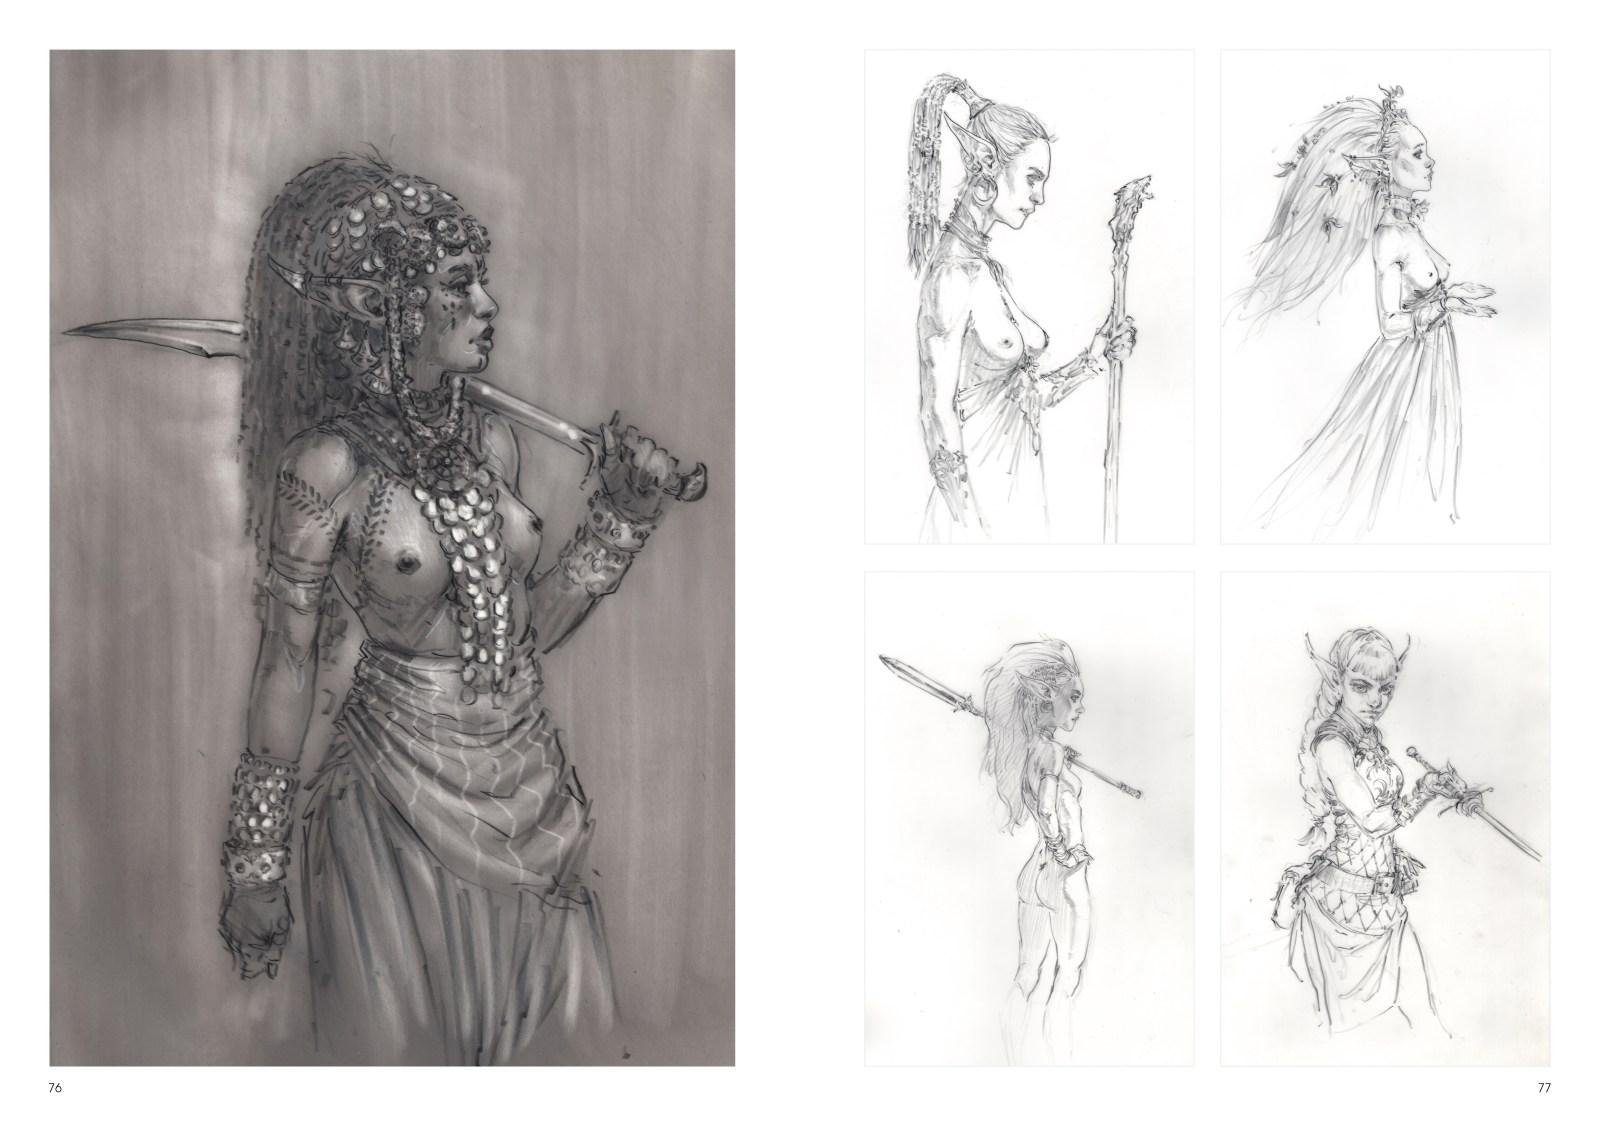 Image de l'artbook Daya de Daniel Landerman. Femmes mystiques.